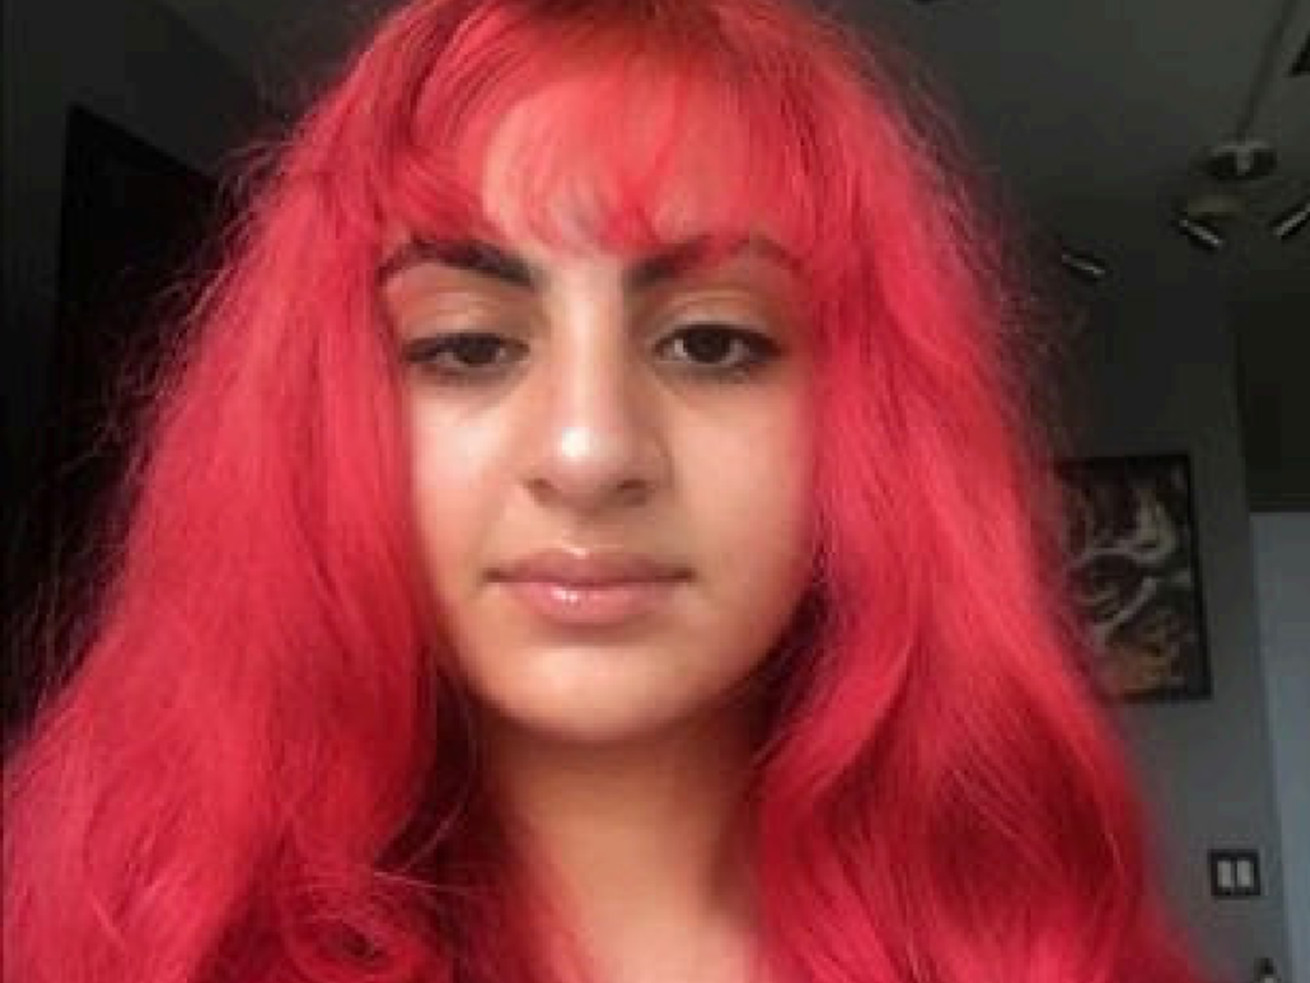 Angelina Alkhafaji, 12